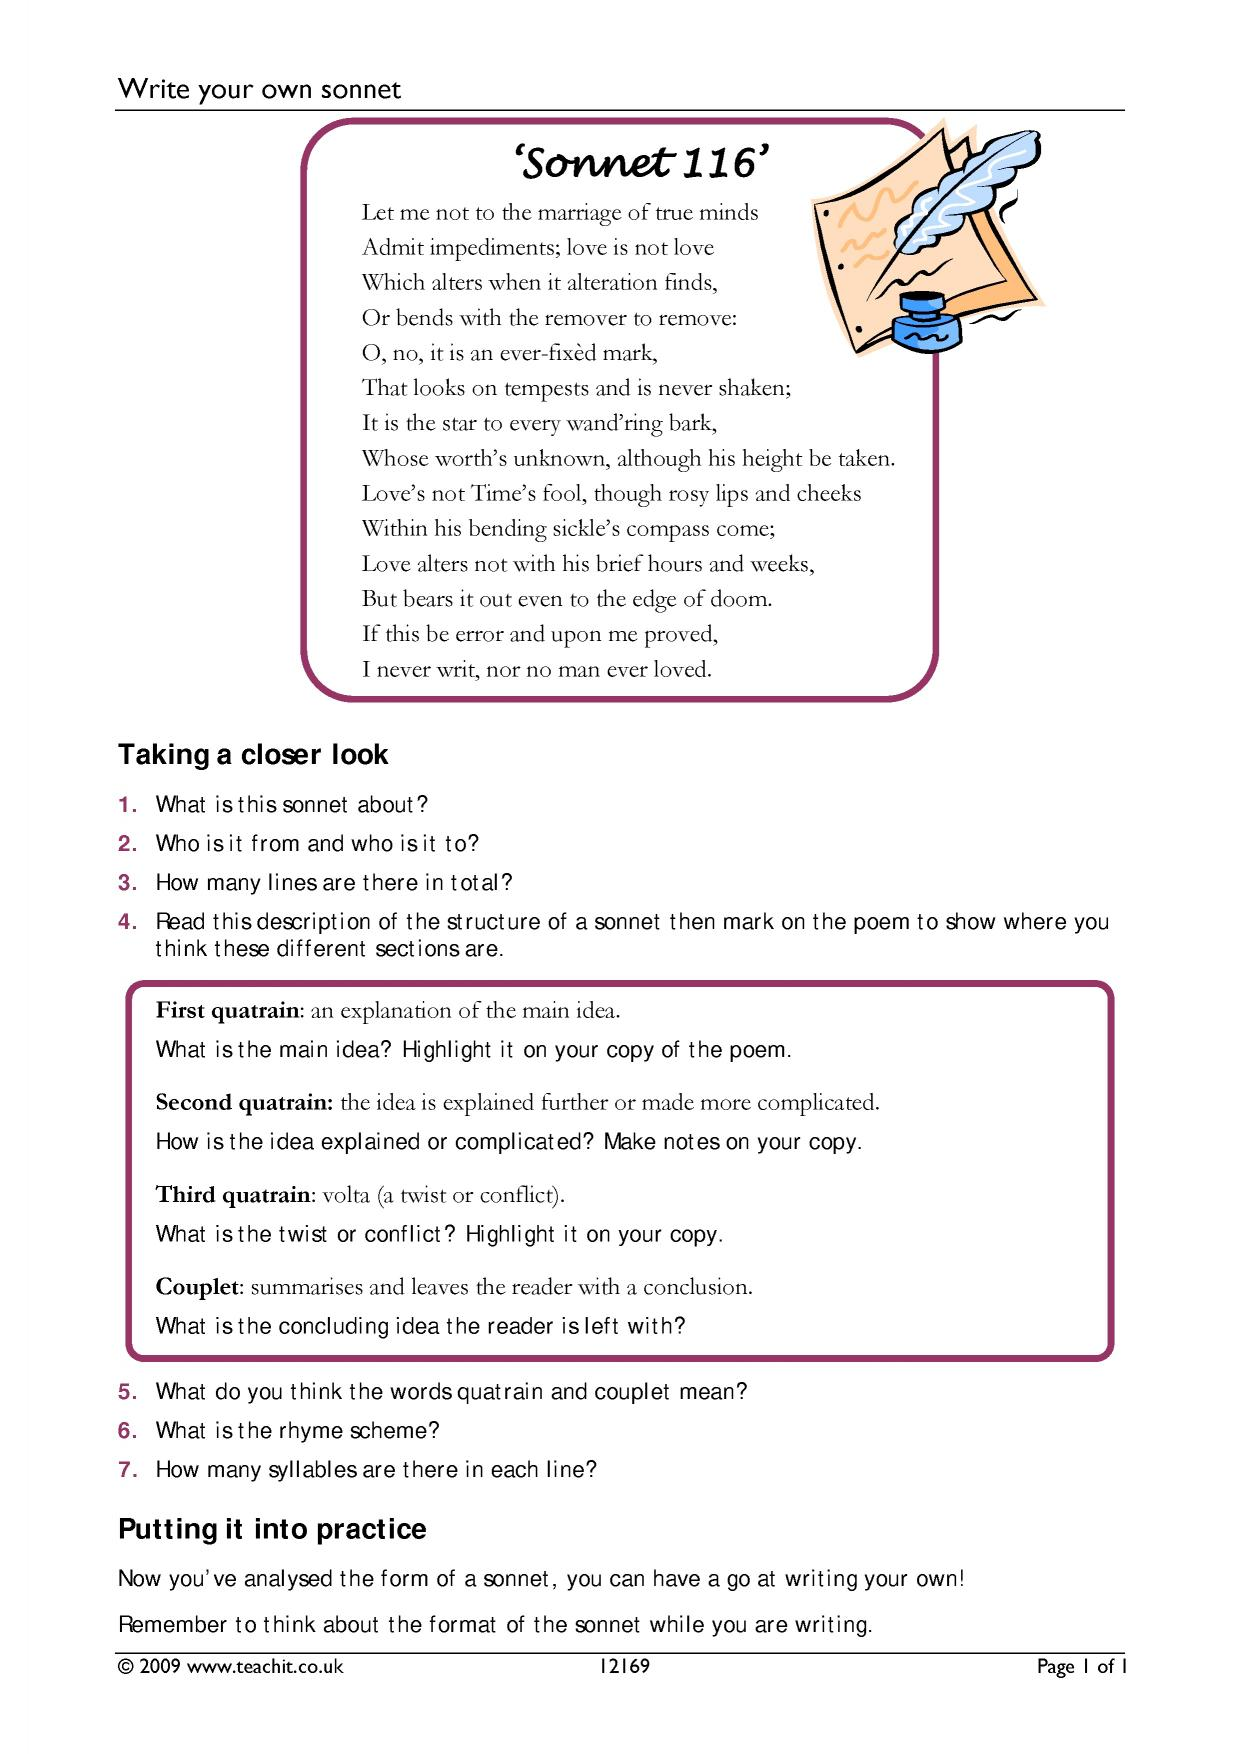 Hematology essay questions photo 2